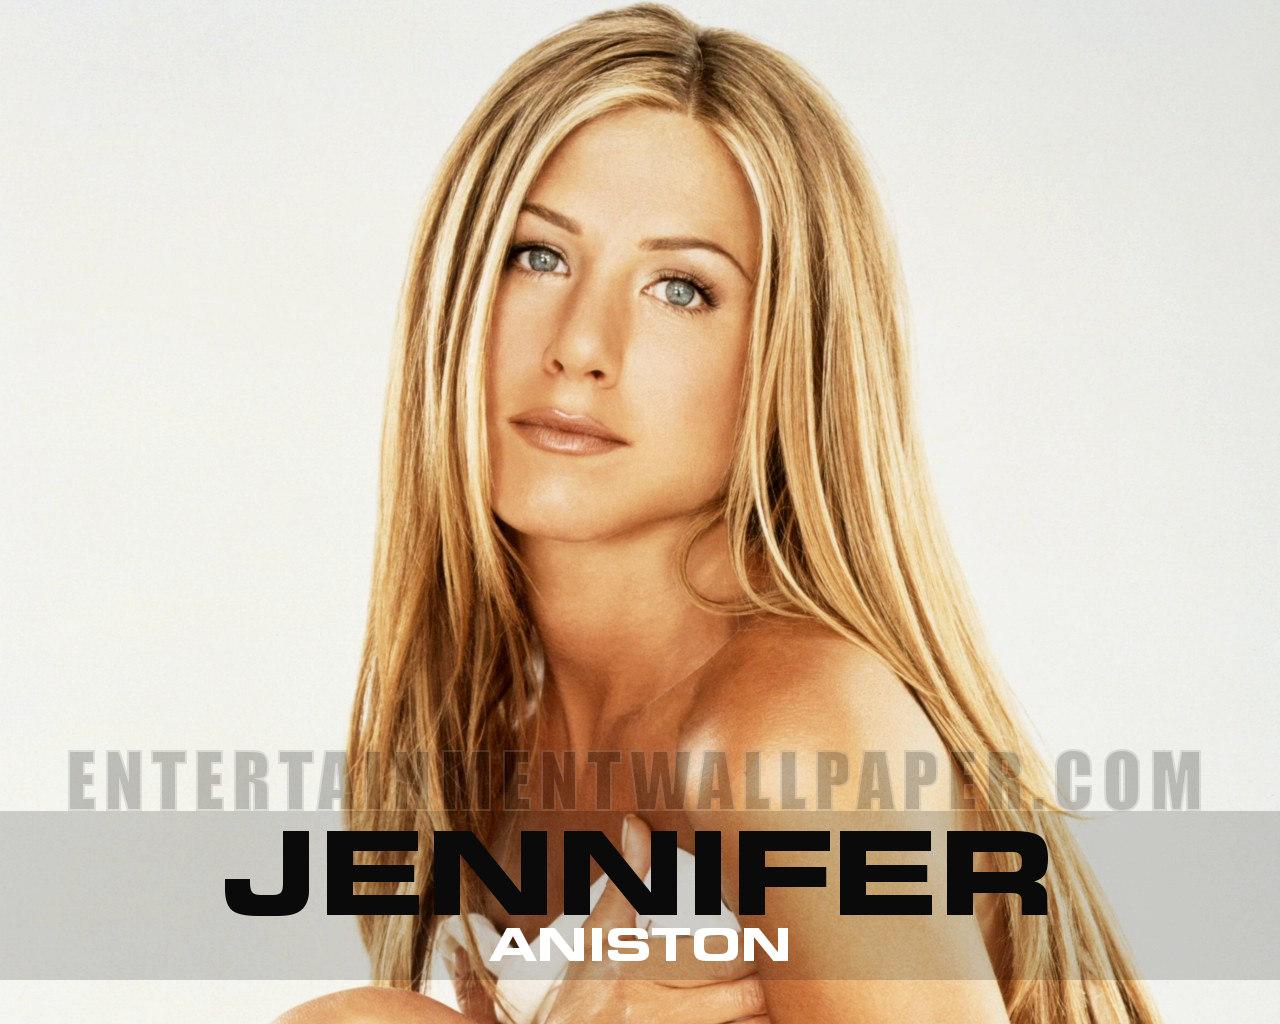 Jennifer Aniston born February 11, 1969 (age 49)